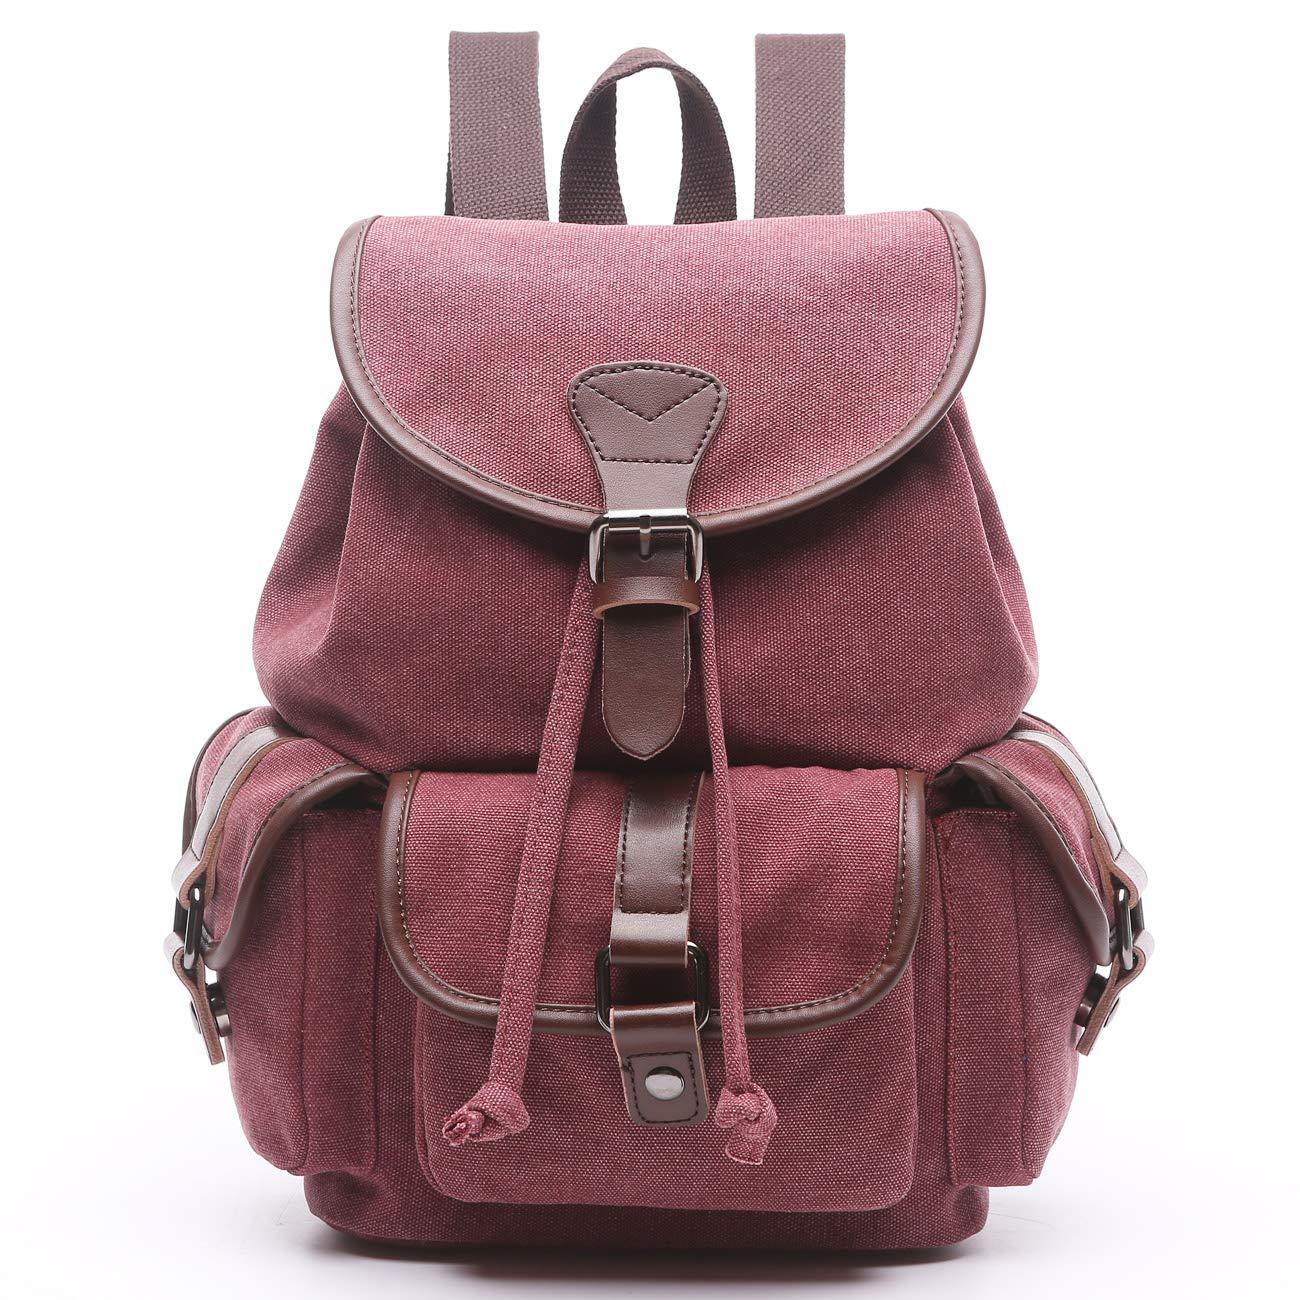 Women Canvas Backpack Purse Vintage Travel Rucksack for Teenager Girls College School Cute Slim Denim Fashion Daypack Bag (Purplish red-Small)